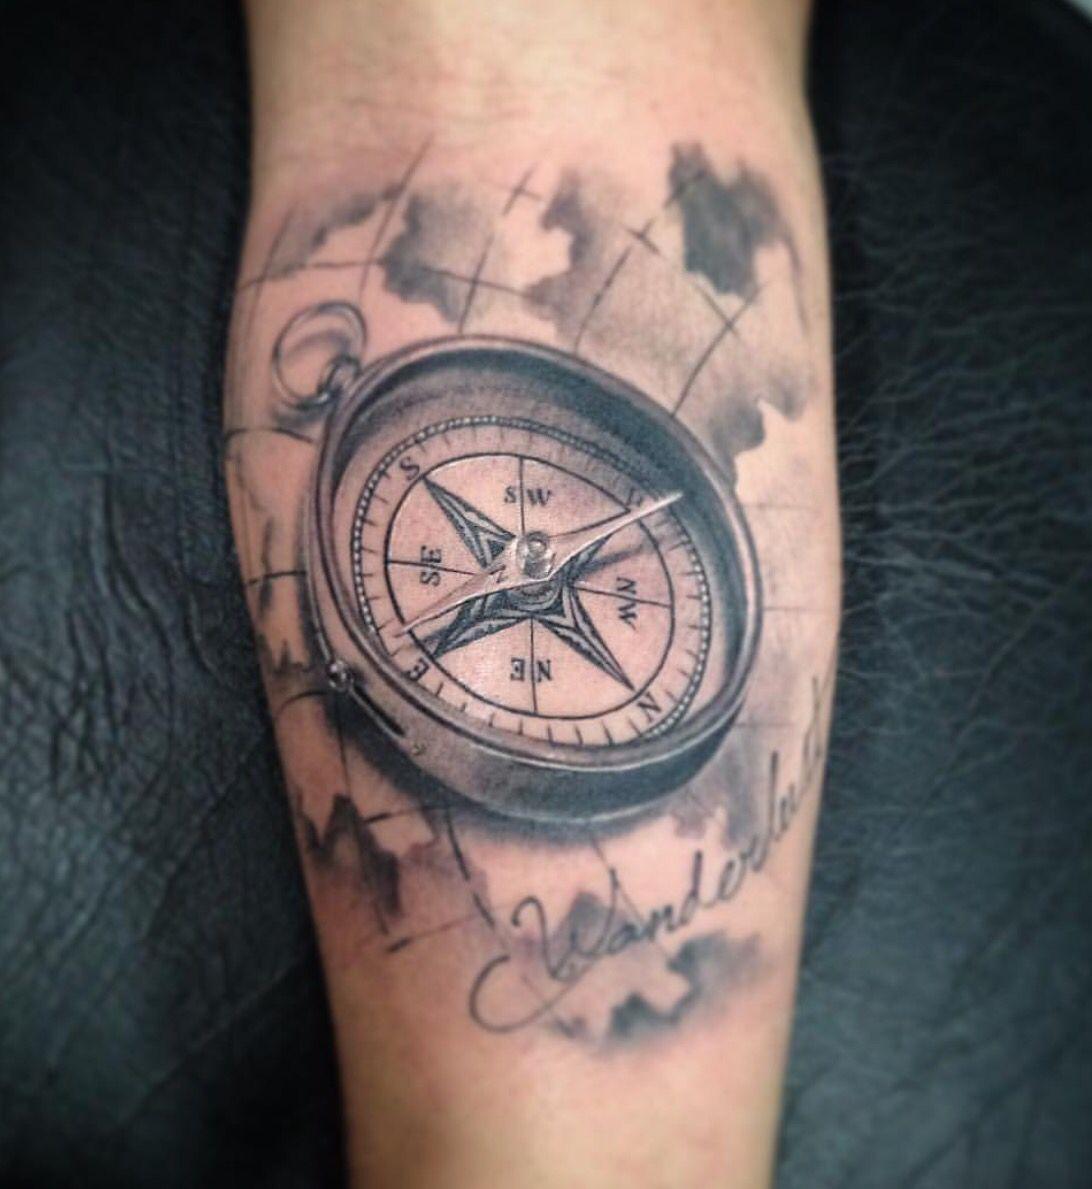 compass tattoo3 pinterest kompass tattoo ideen und tattoo vorlagen. Black Bedroom Furniture Sets. Home Design Ideas